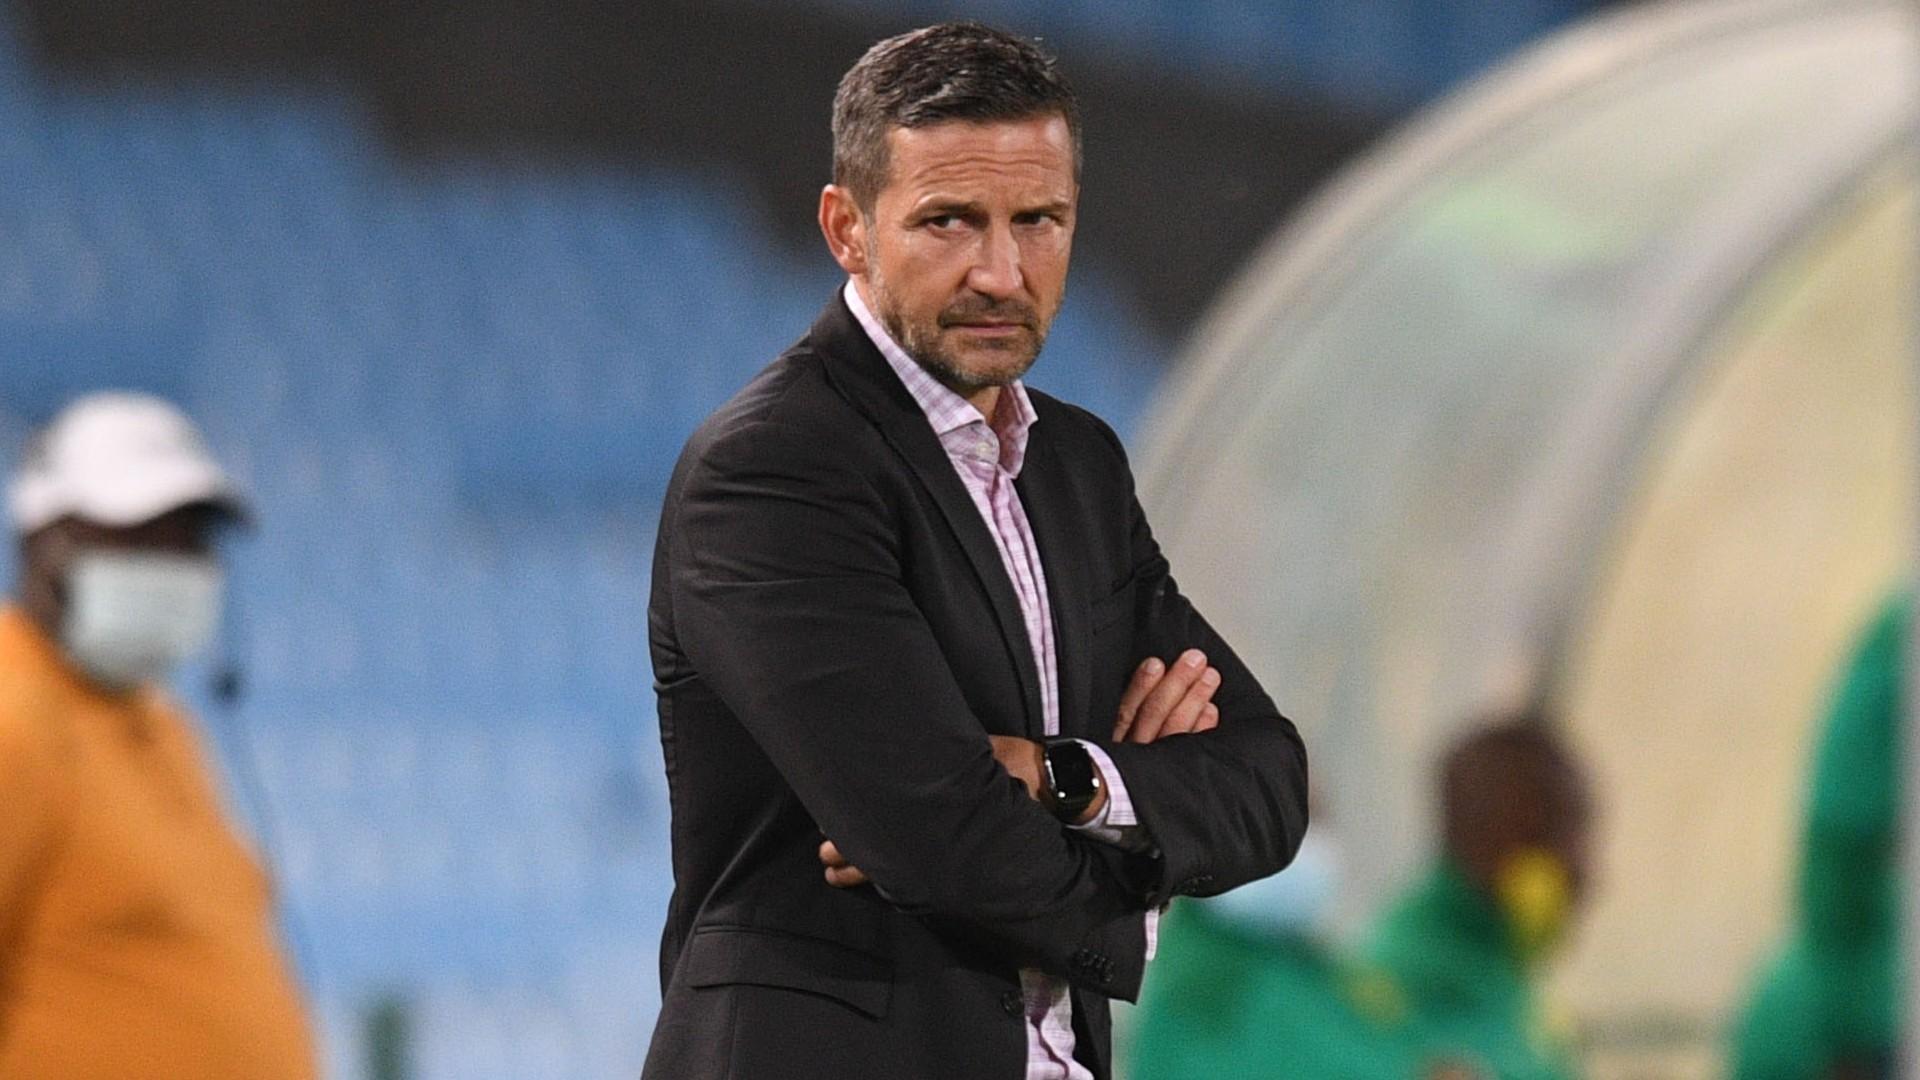 Orlando Pirates coach Zinnbauer breaks silence on Ncikazi appointment